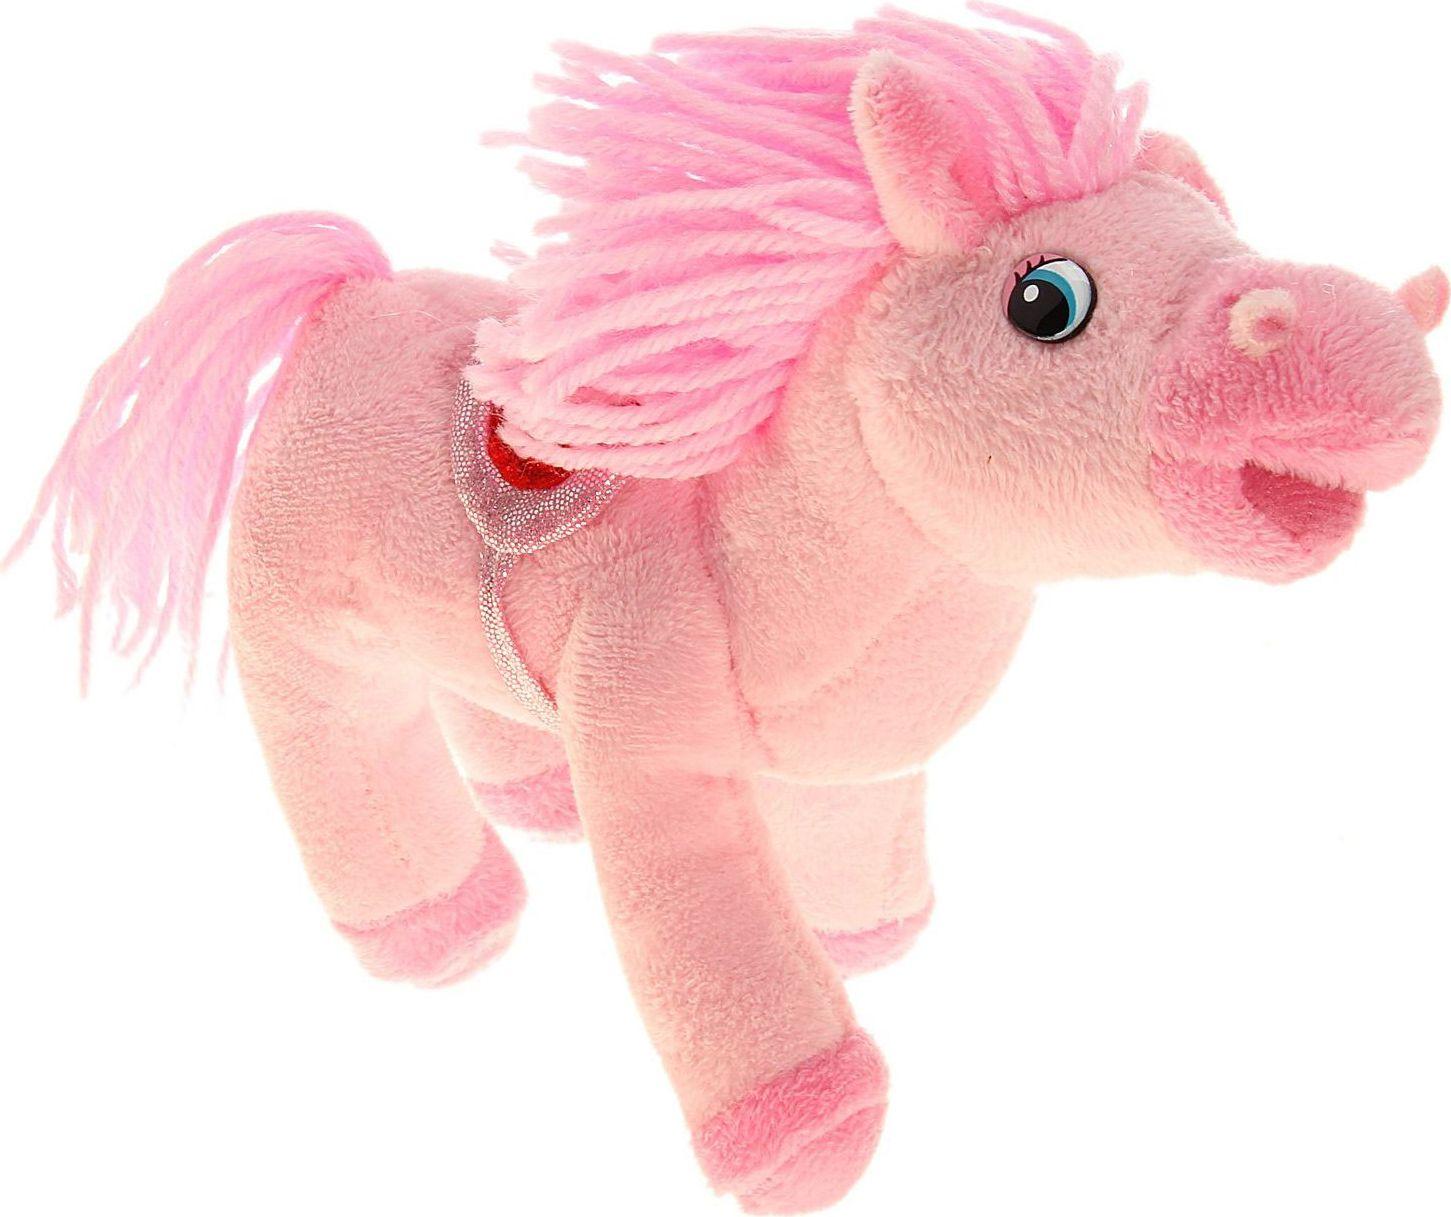 Sima-land Мягкая музыкальная игрушка Лошадь кудрявая цвет розовый 326373 sima land мягкая игрушка на руку мальчик 1147835